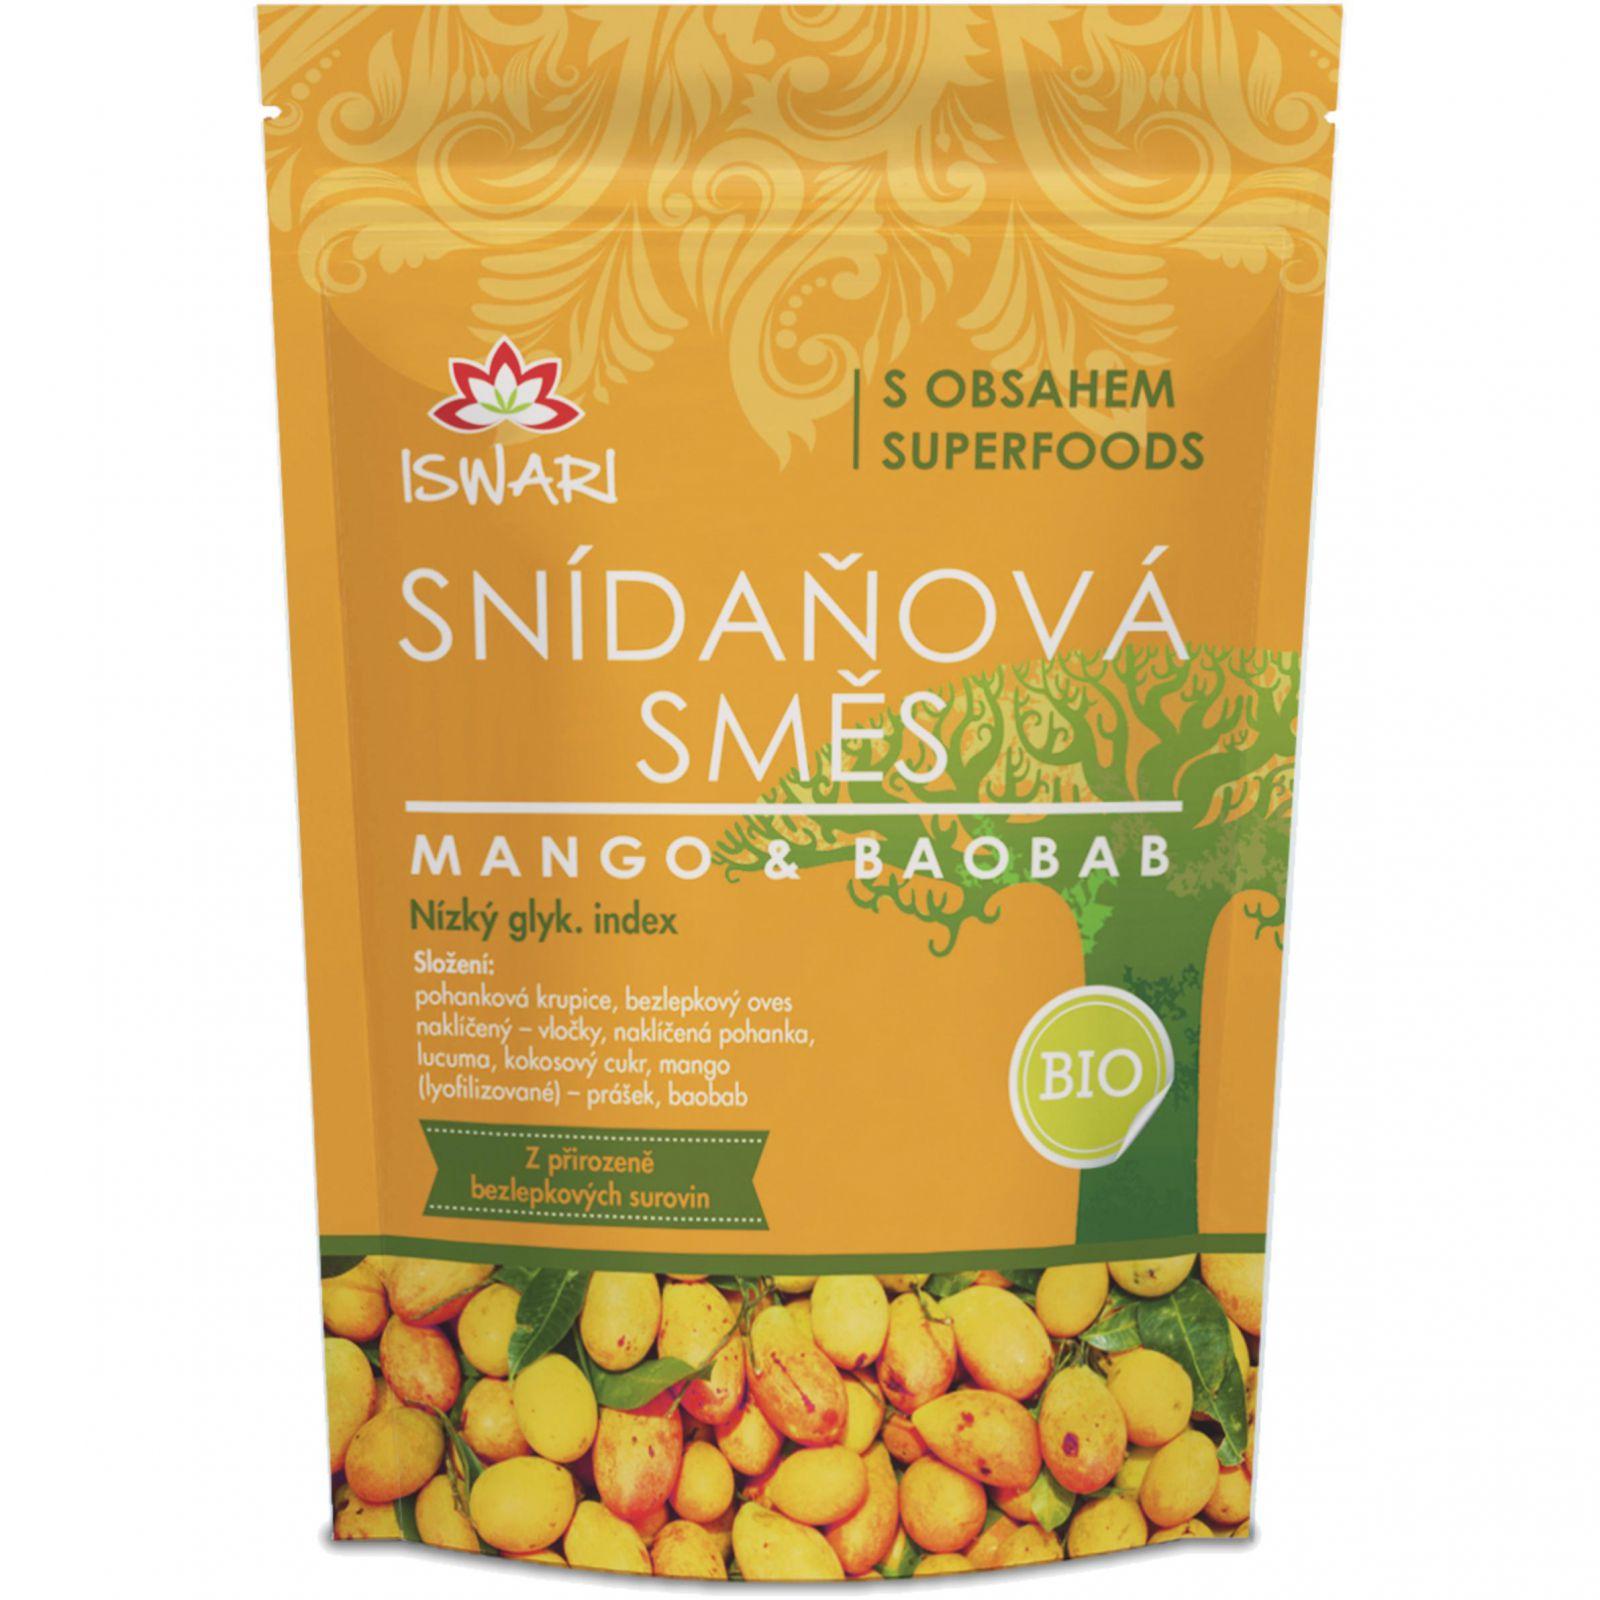 Iswari BIO Snídaňová směs 300 g - mango & baobab